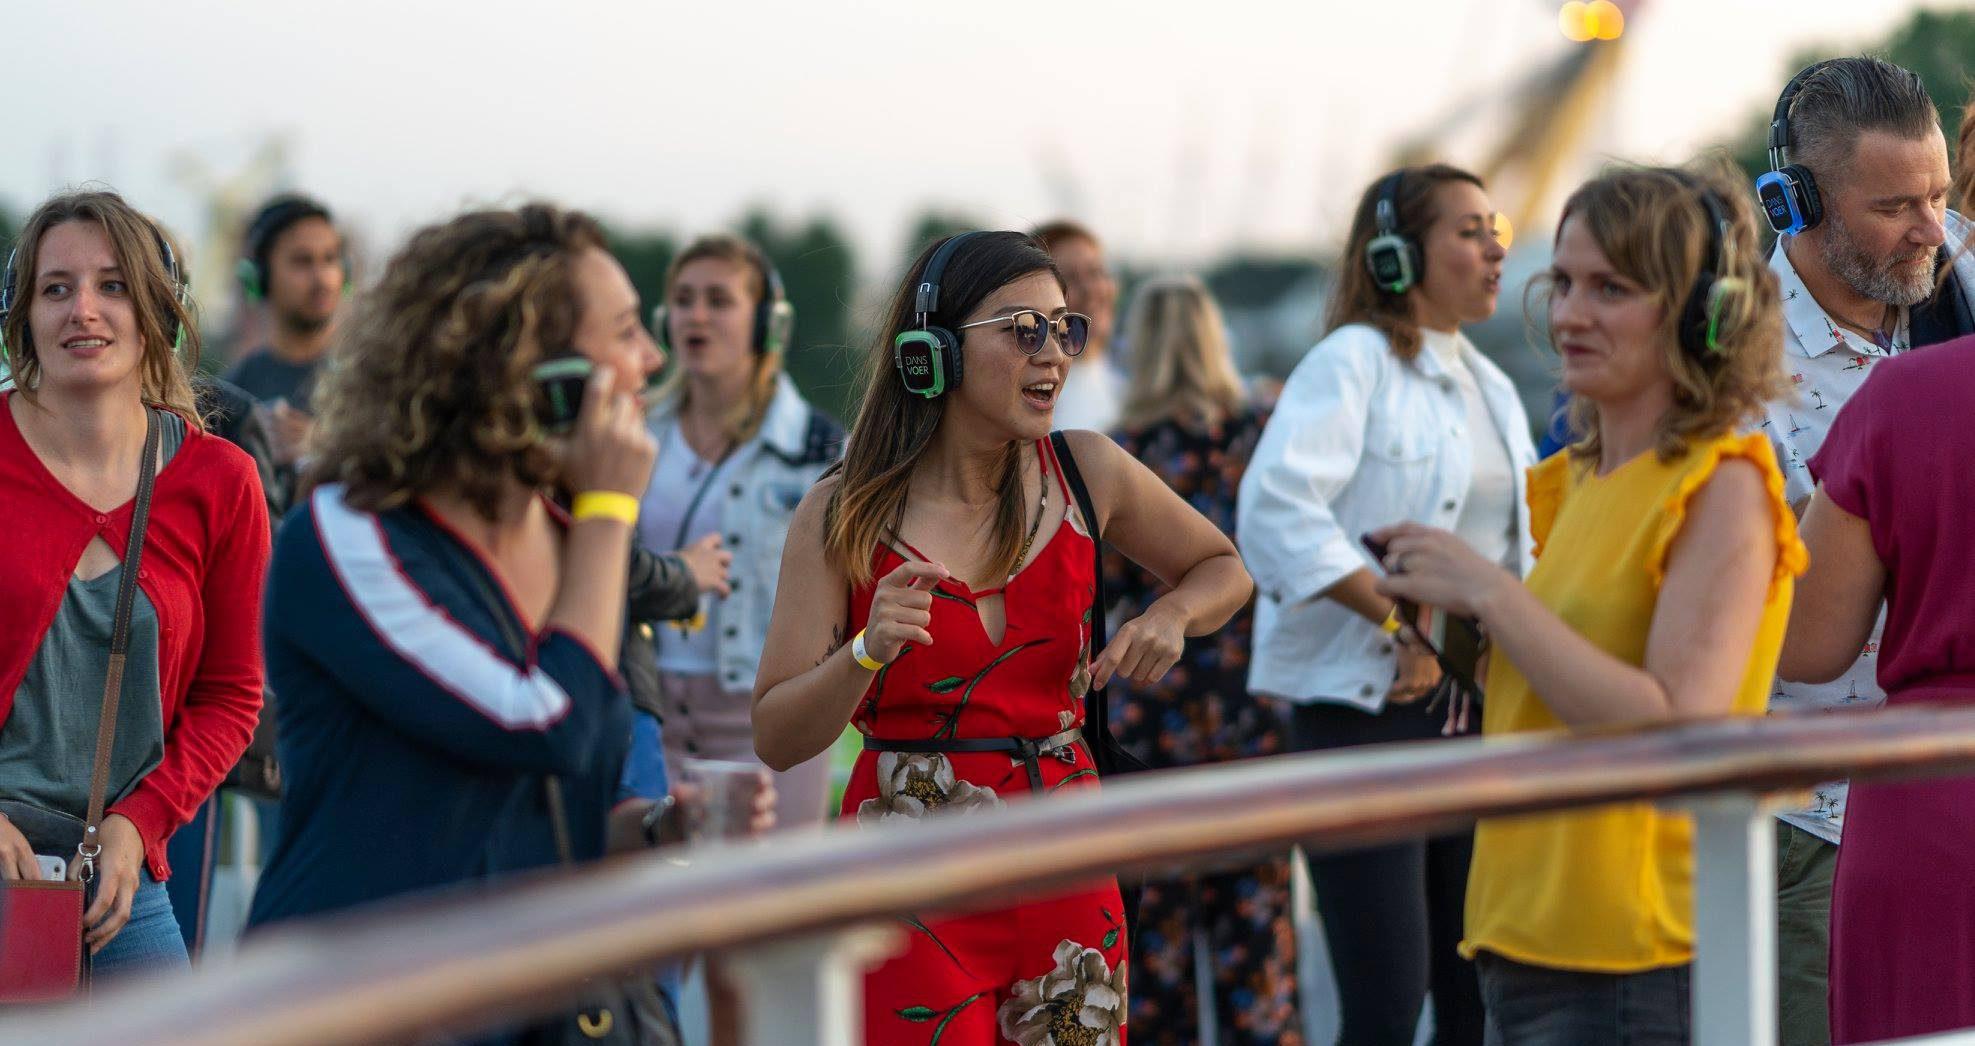 Dansende mensen tijdens DANSVOER Silent Disco op SS Rotterdam tijdens Rotterdamse Dakendagen 2018